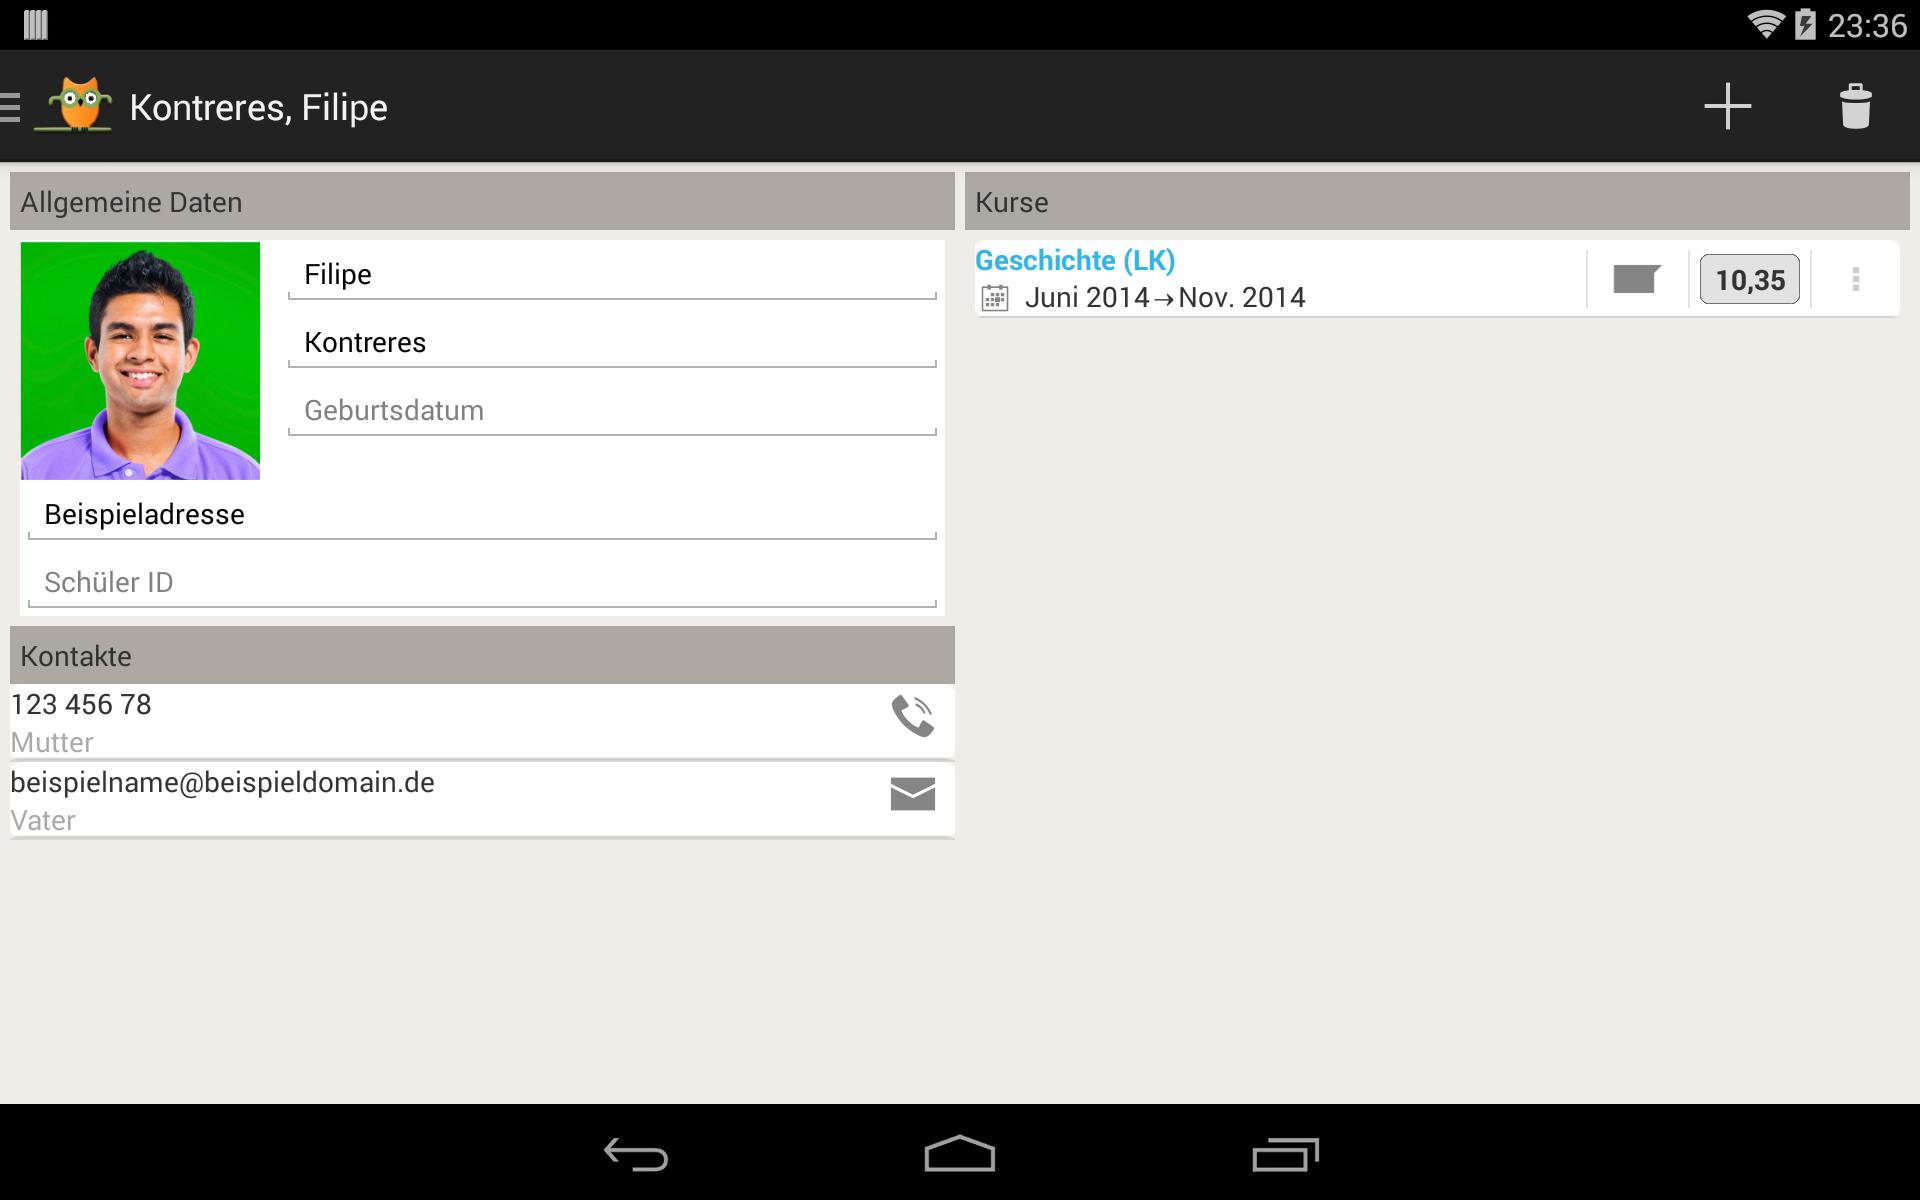 TeacherStudio-Handbuch-Android-Tablet-Schüler-Kontaktinformationen